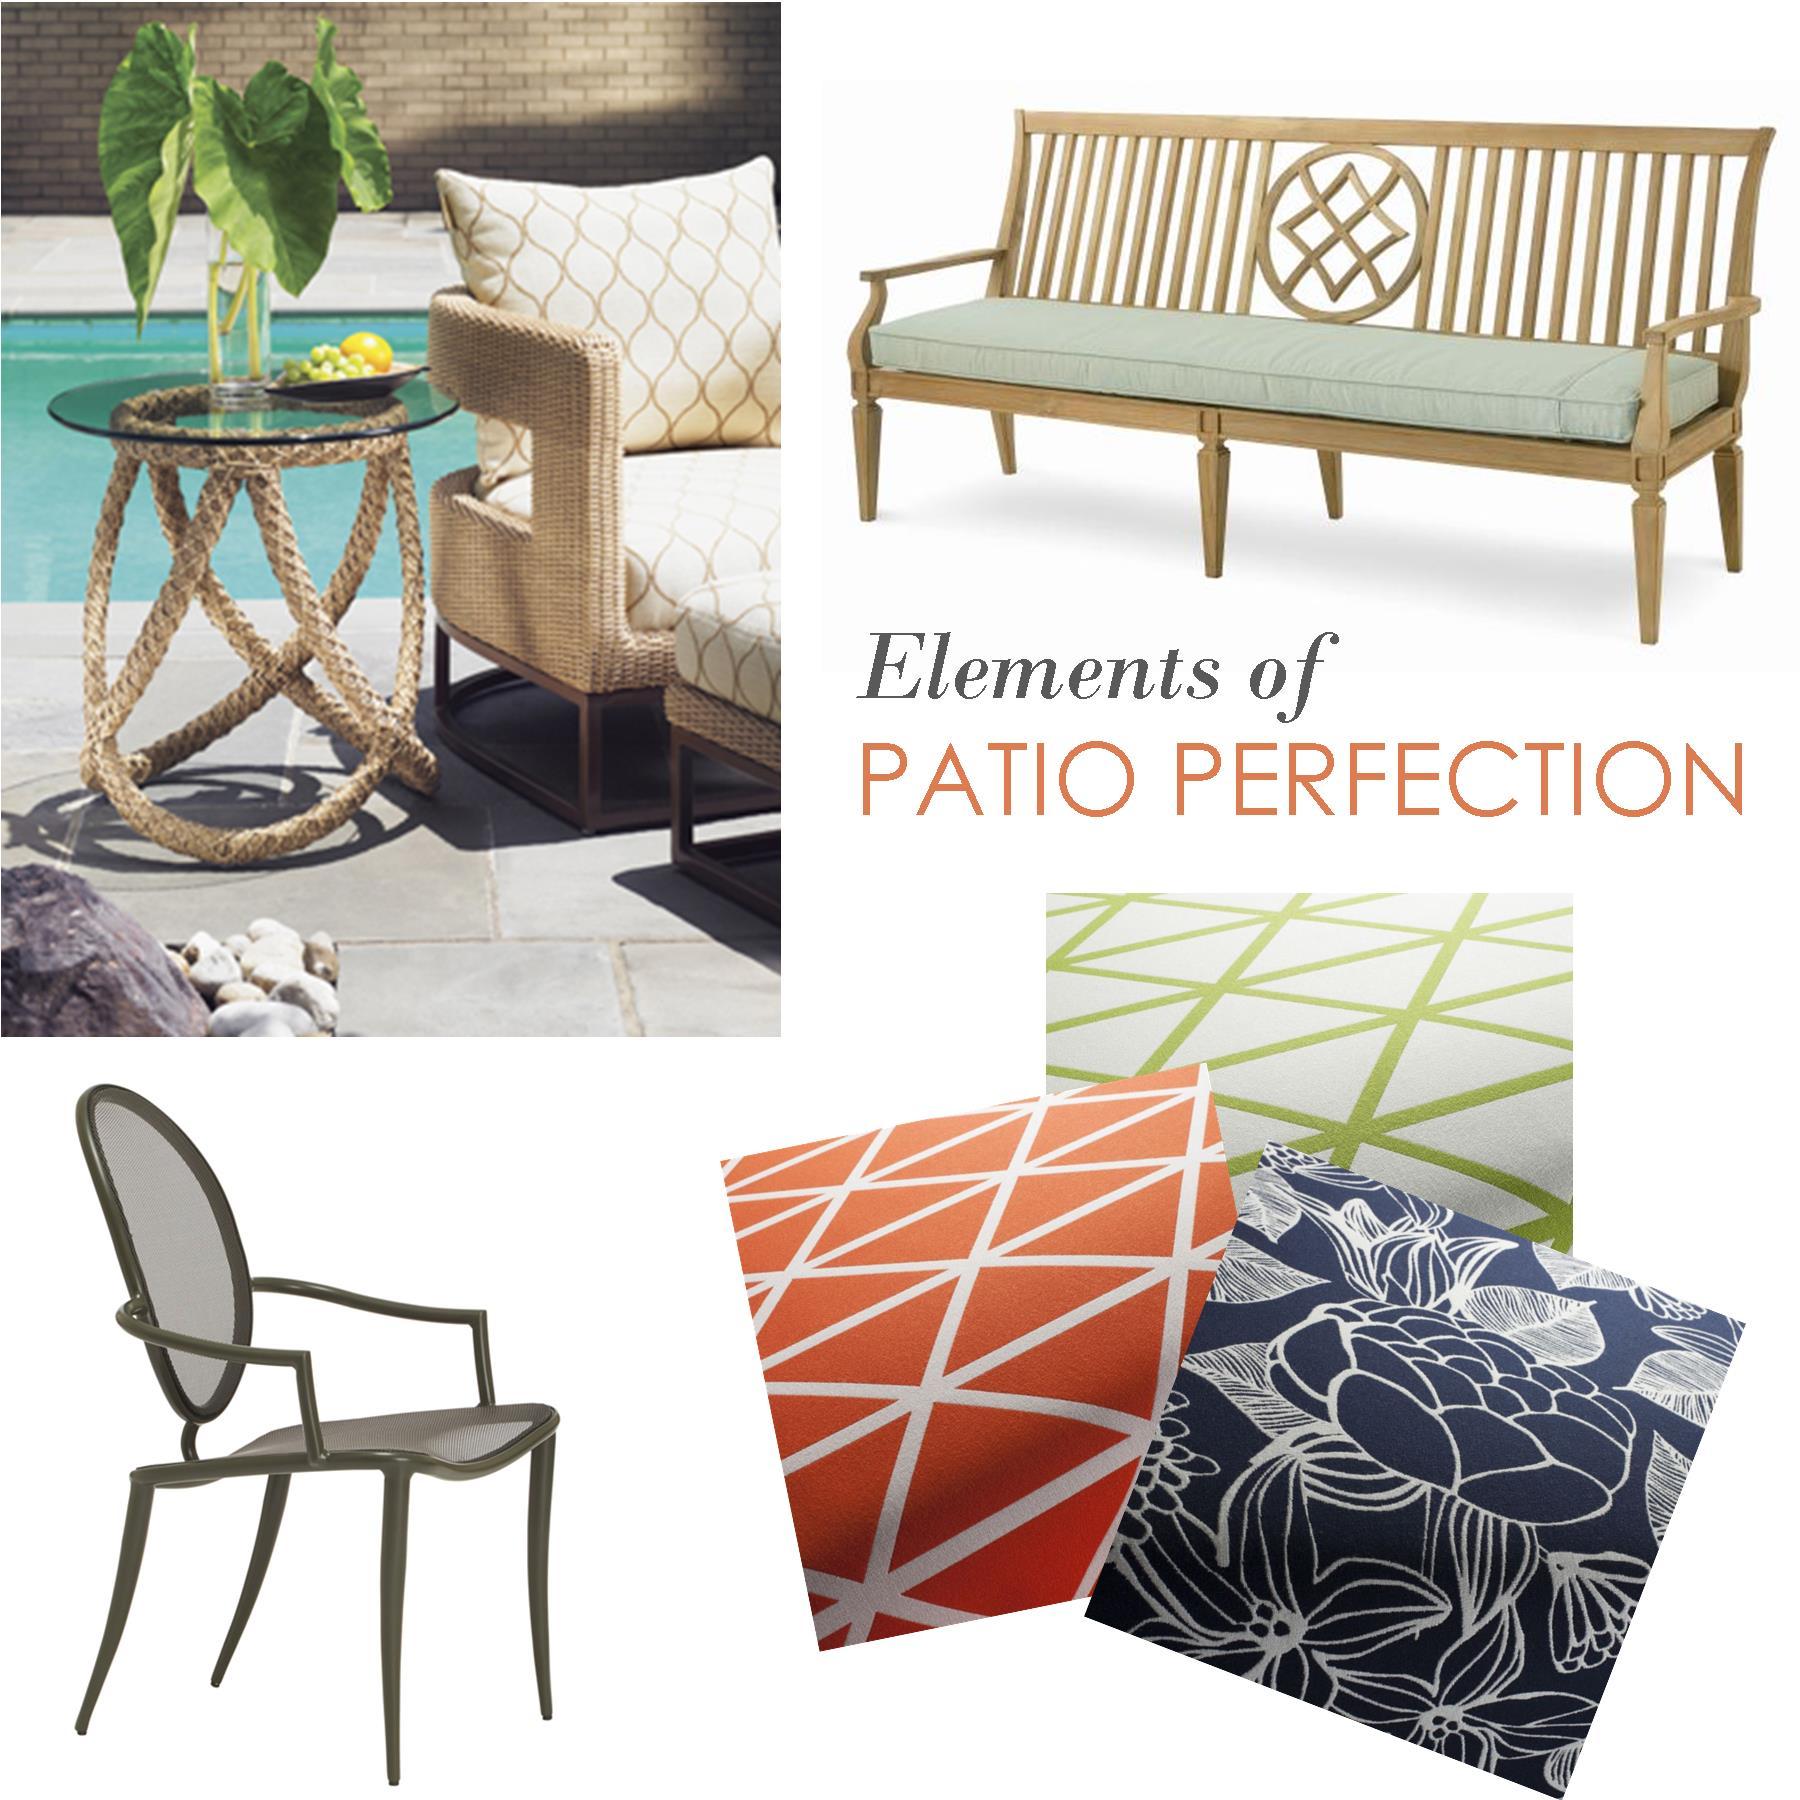 Outdoor Furniture Fabric Bringing Casual Comfort To Outdoor Spaces Interior Design Center